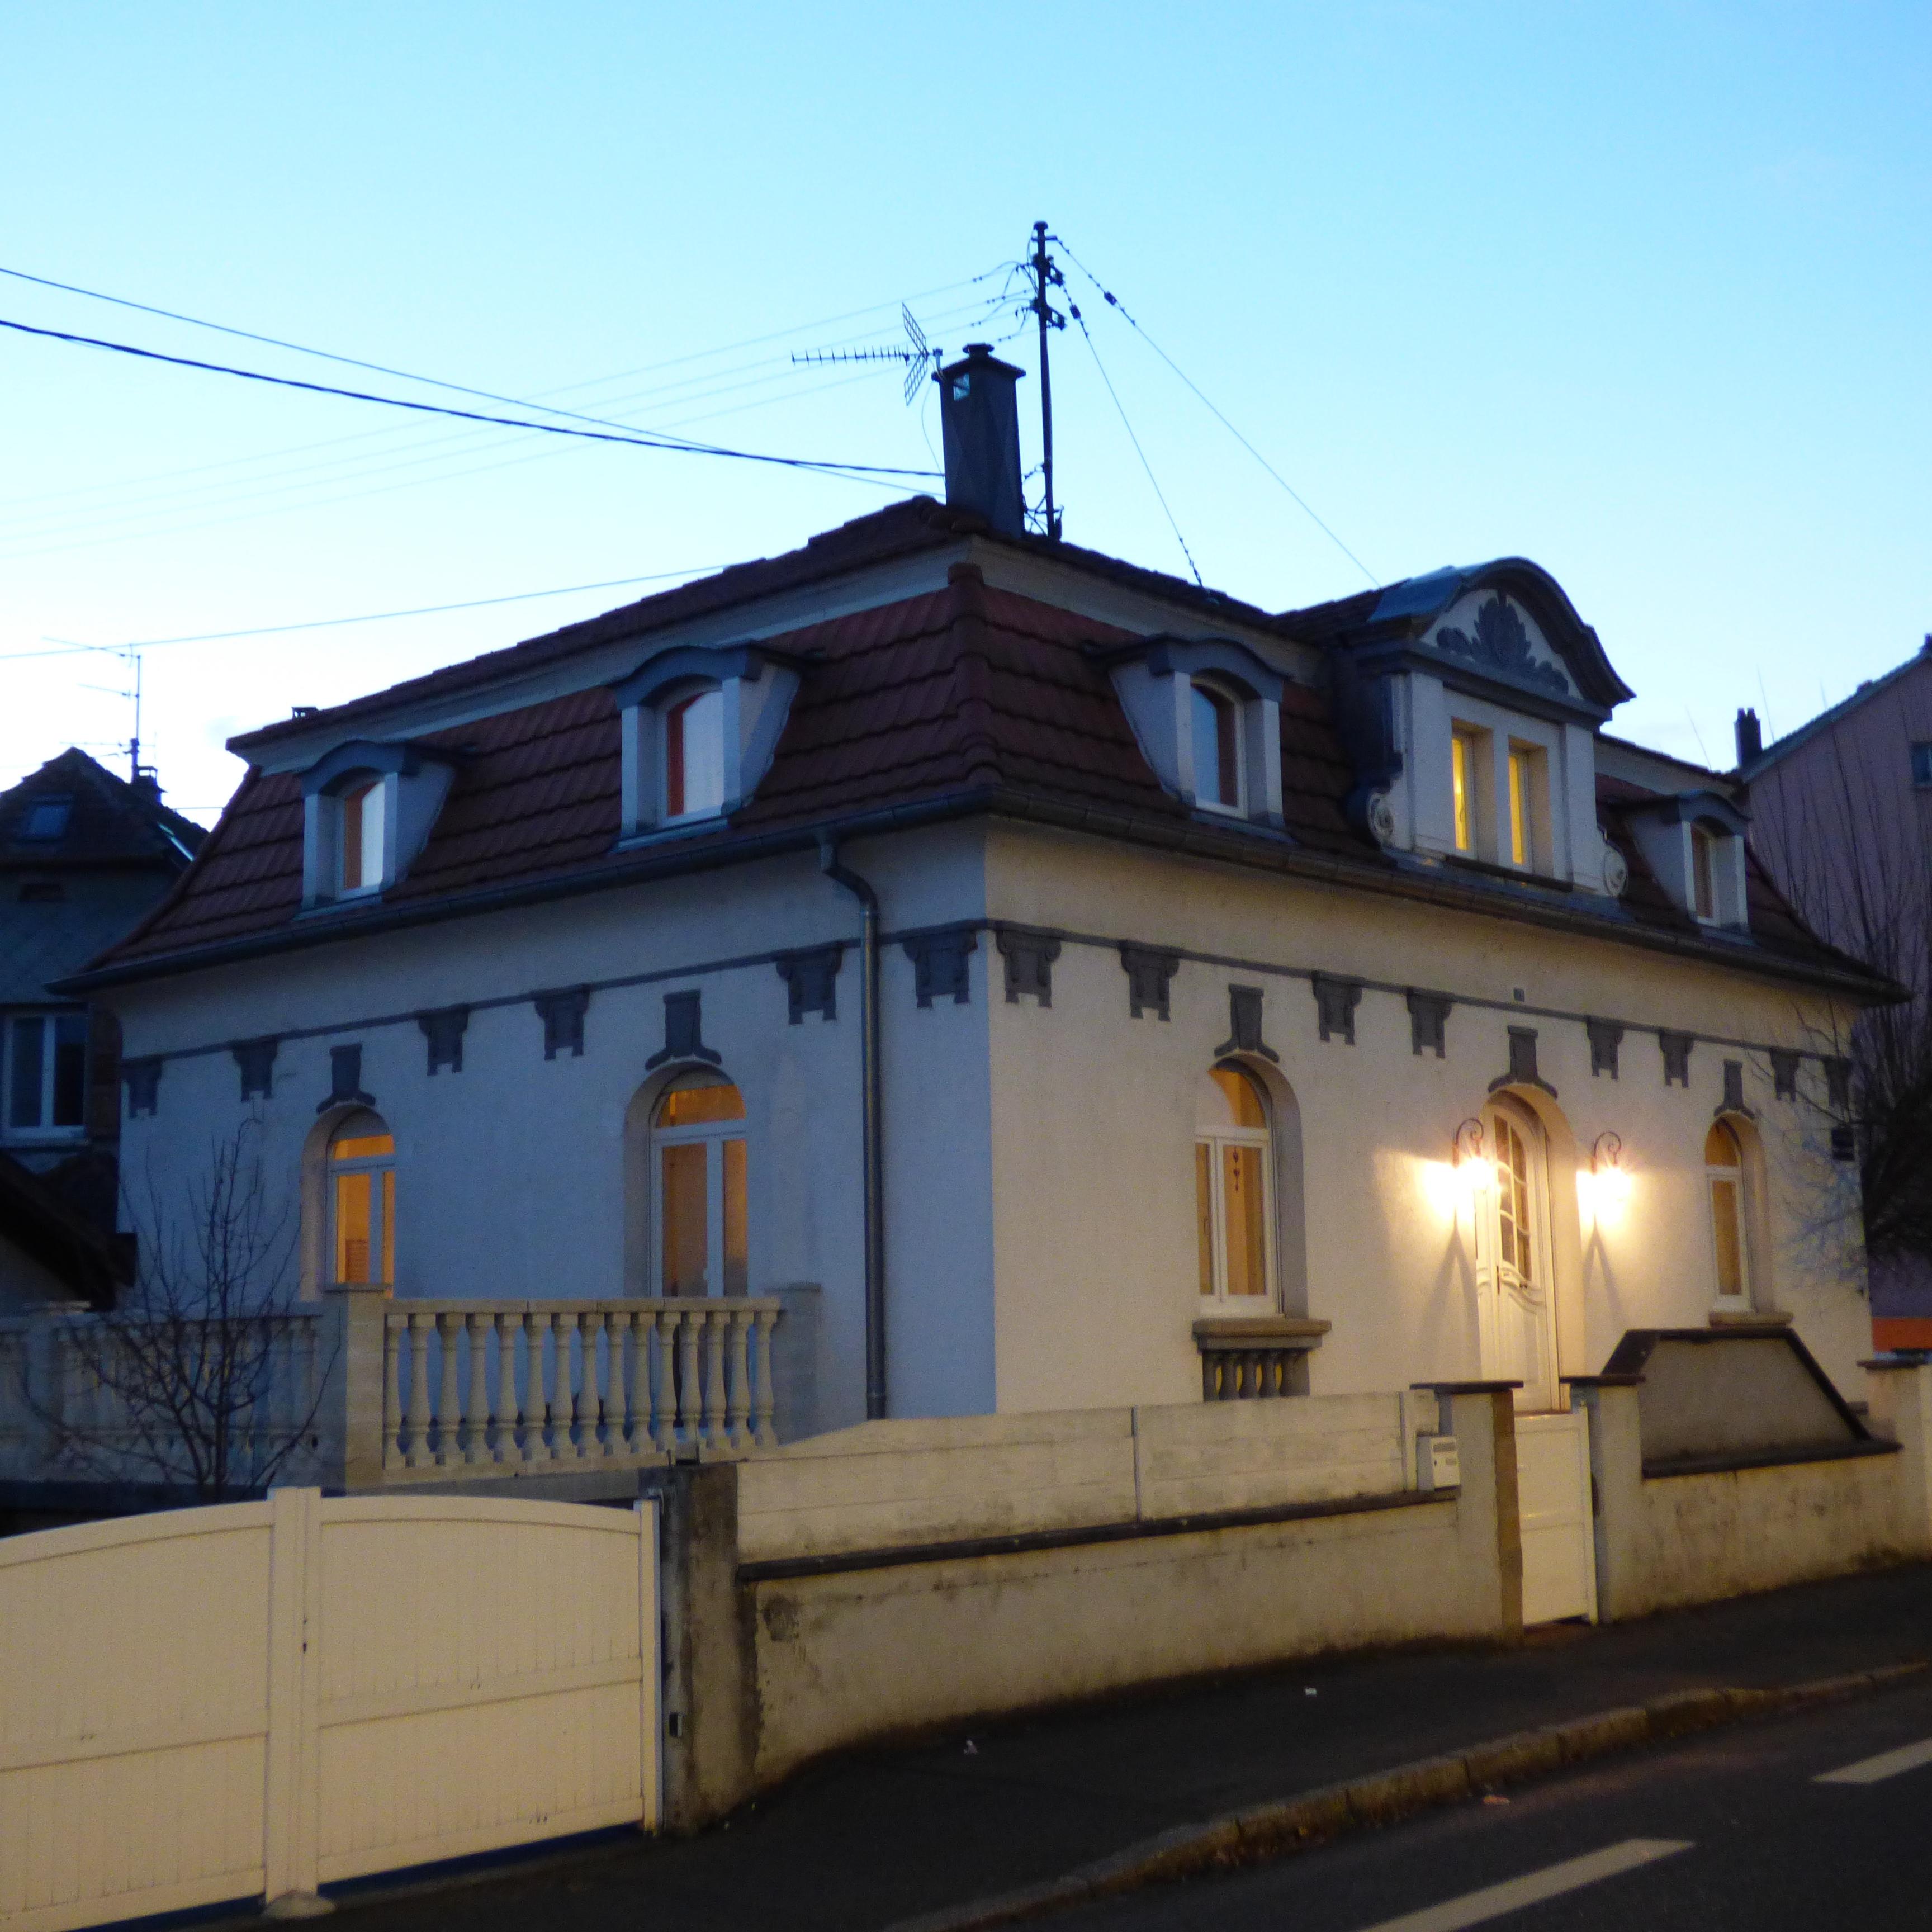 Maison familiale en Centre-Alsace / Sleeping 12 - Haustausch